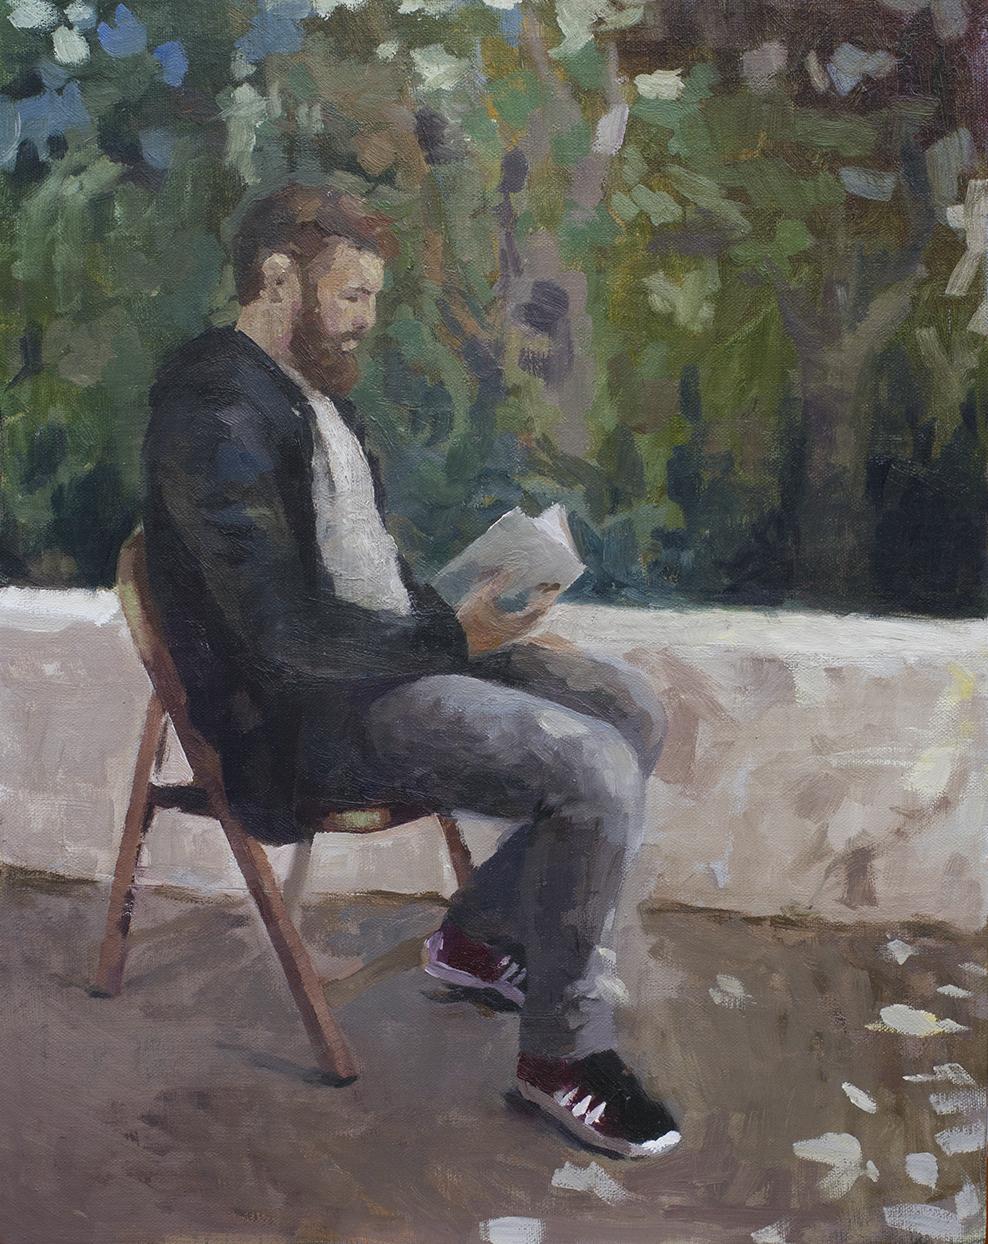 Lautaro leyendo a la sombra